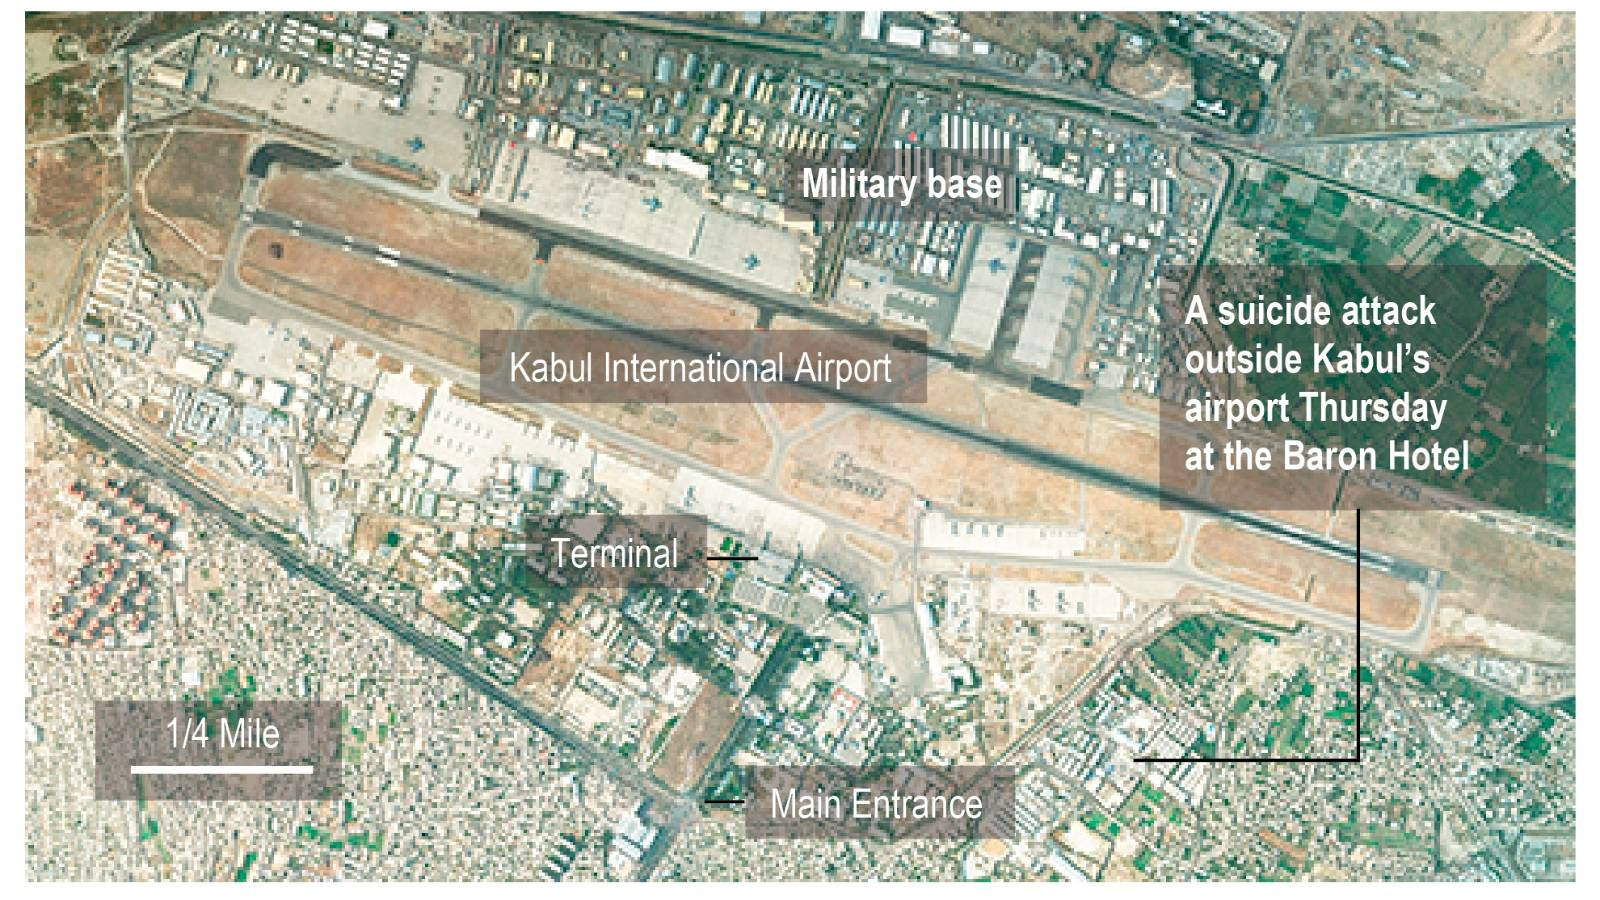 Kabul bombing: 60 civilians, 12 US service members killed